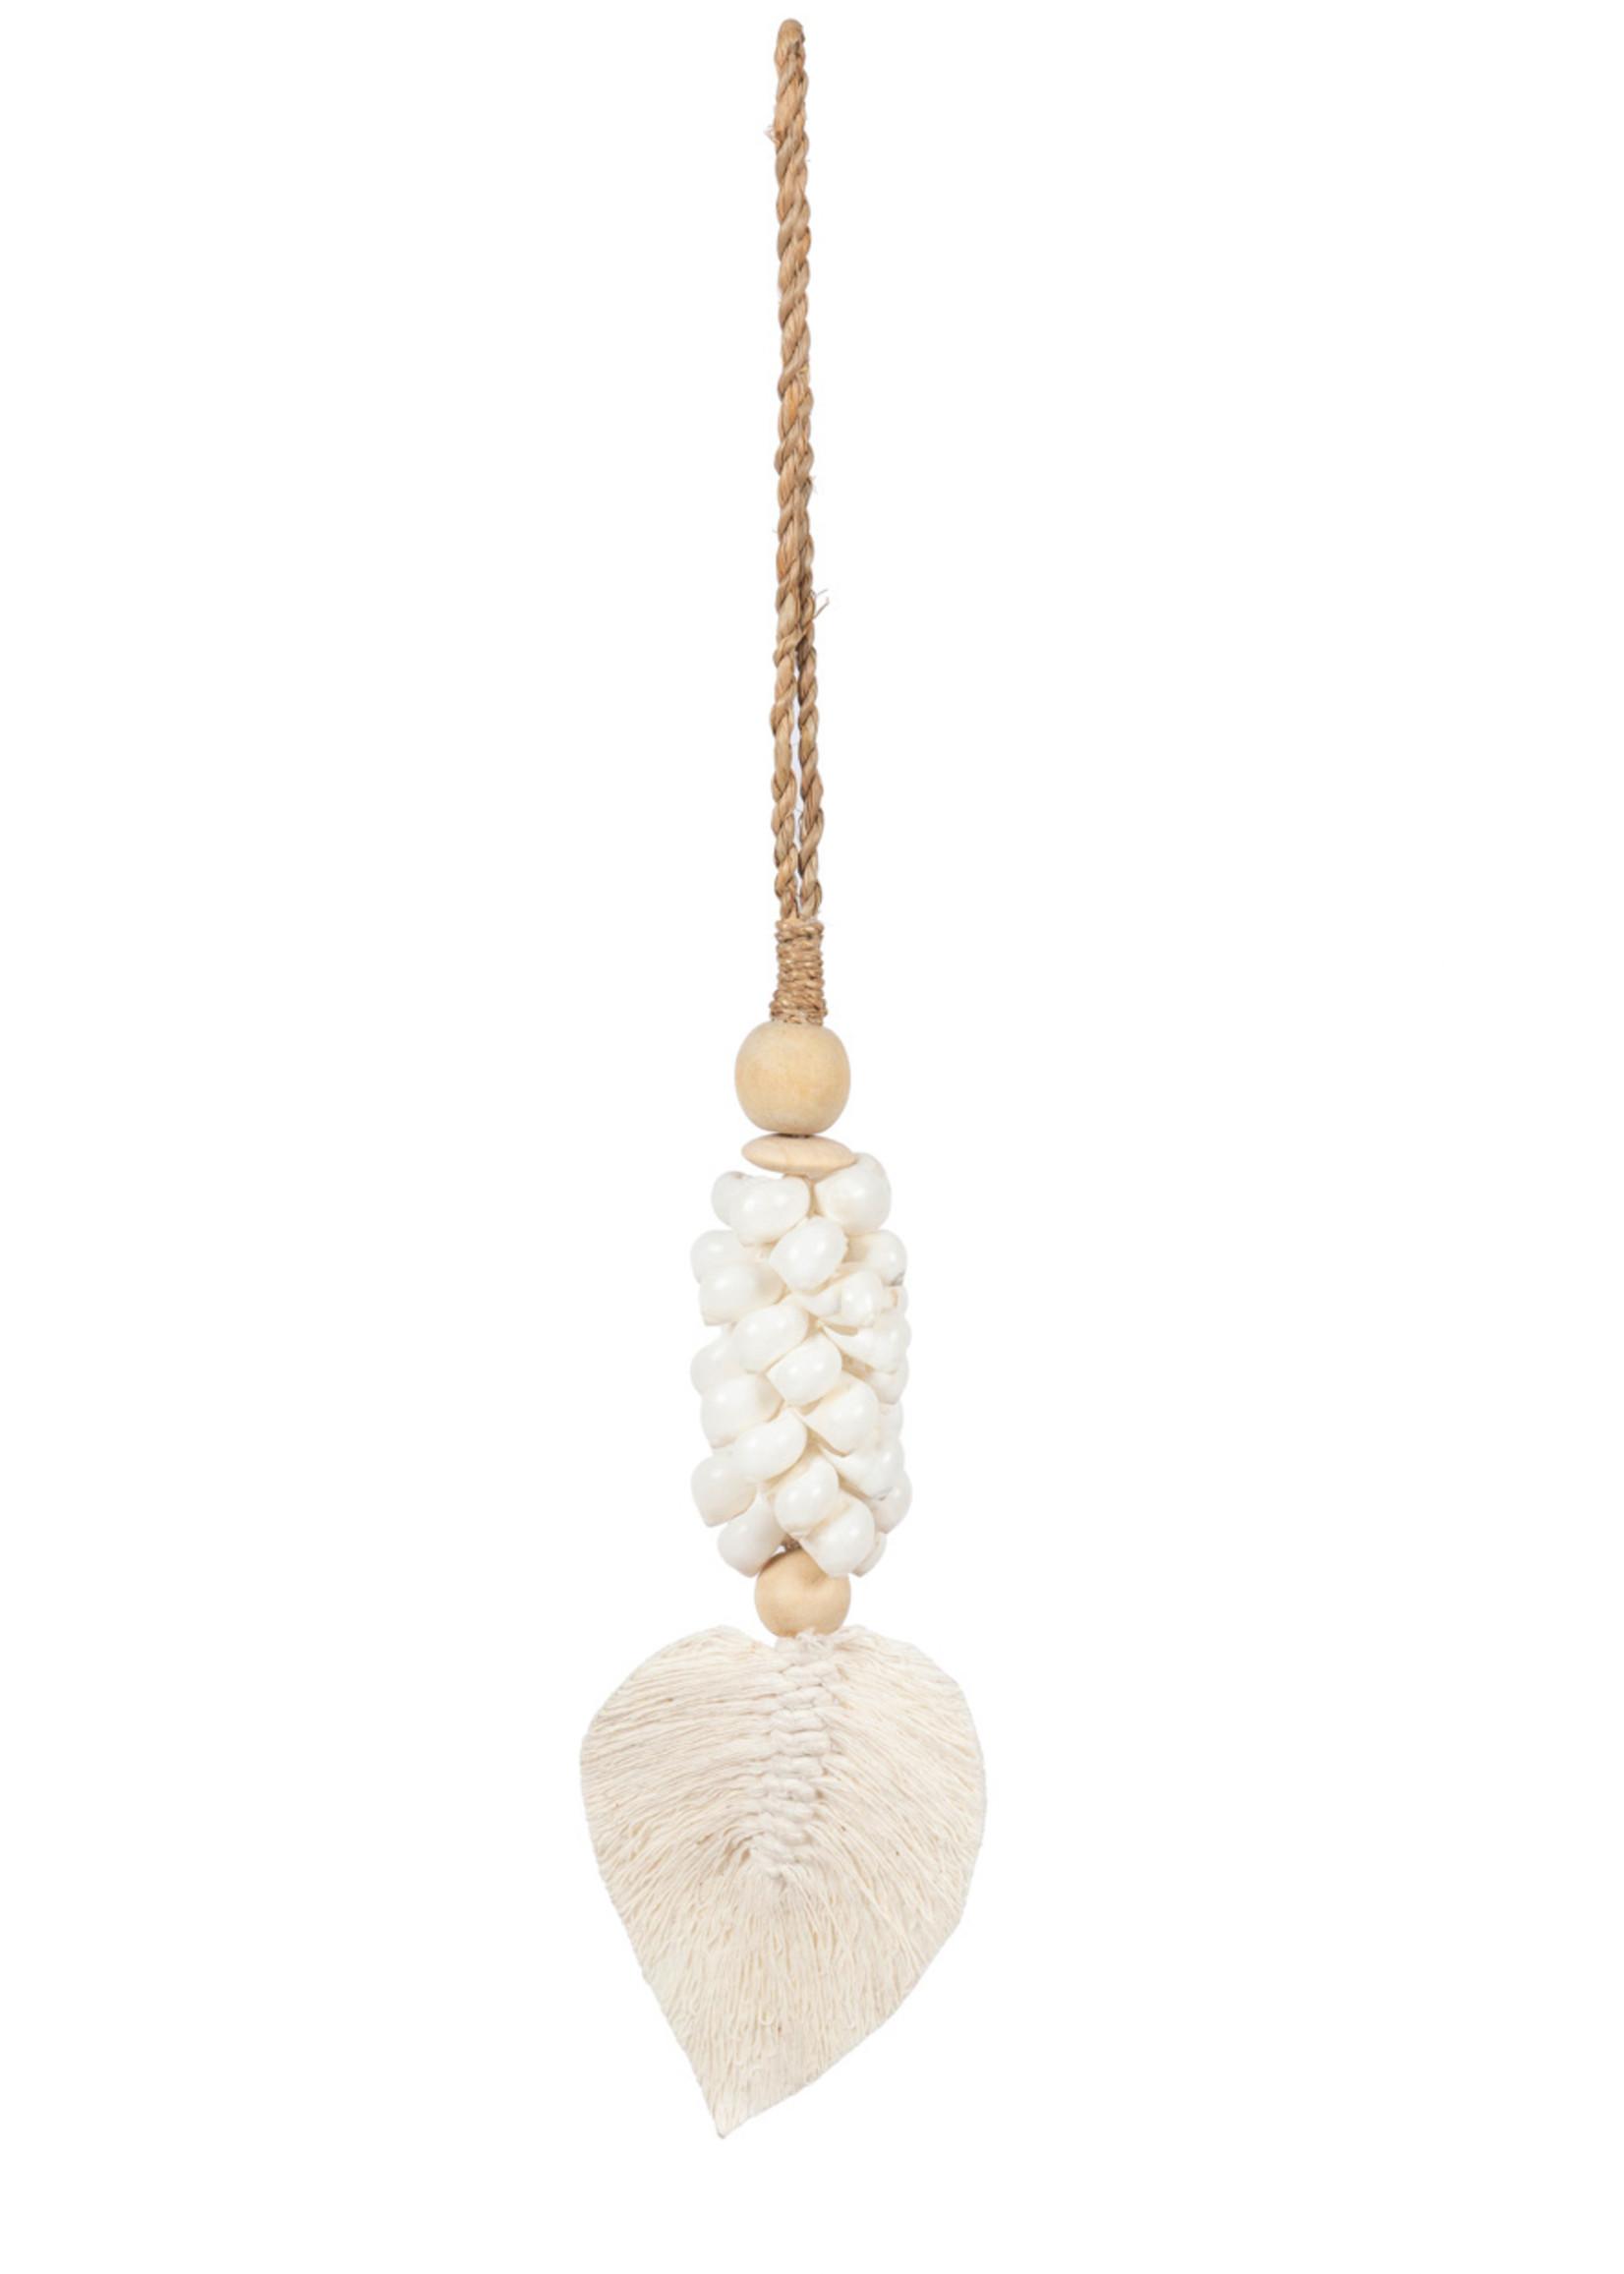 The Leaf Cowrie Tassel - White